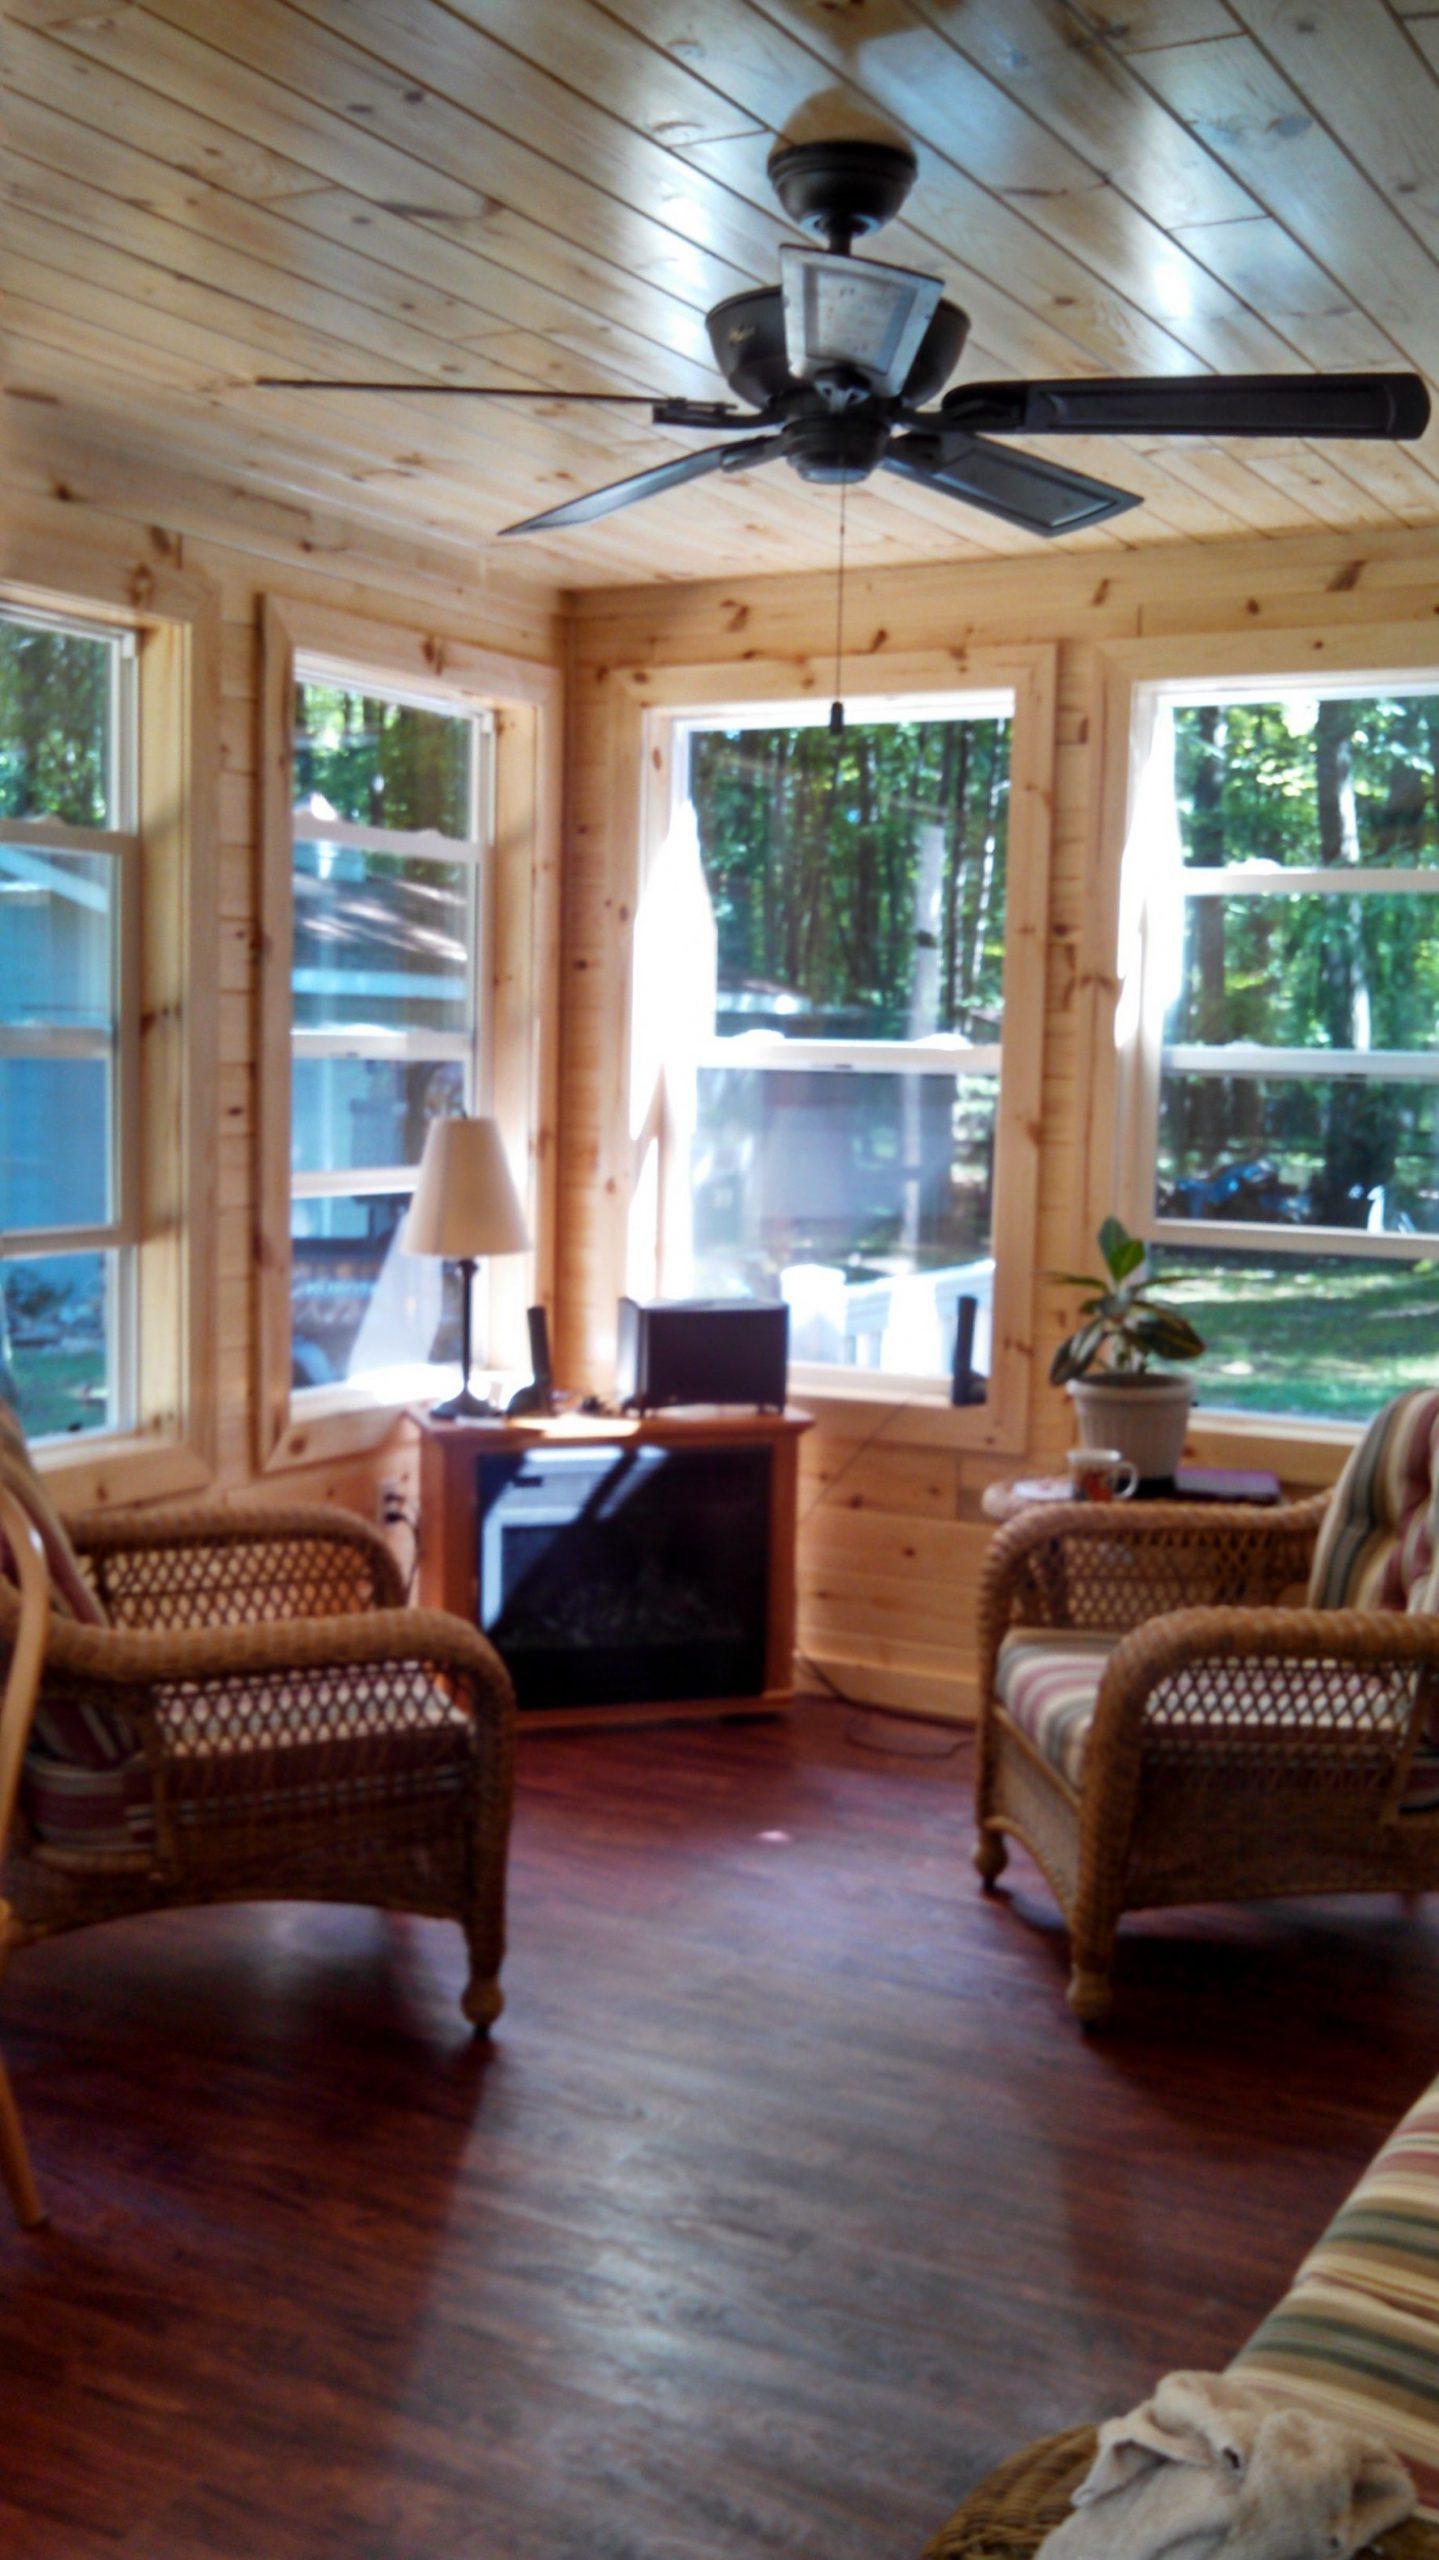 knotty pine sunroom  Small sunroom, Porch to sunroom, Sunroom  - Small Sunroom Off Bedroom